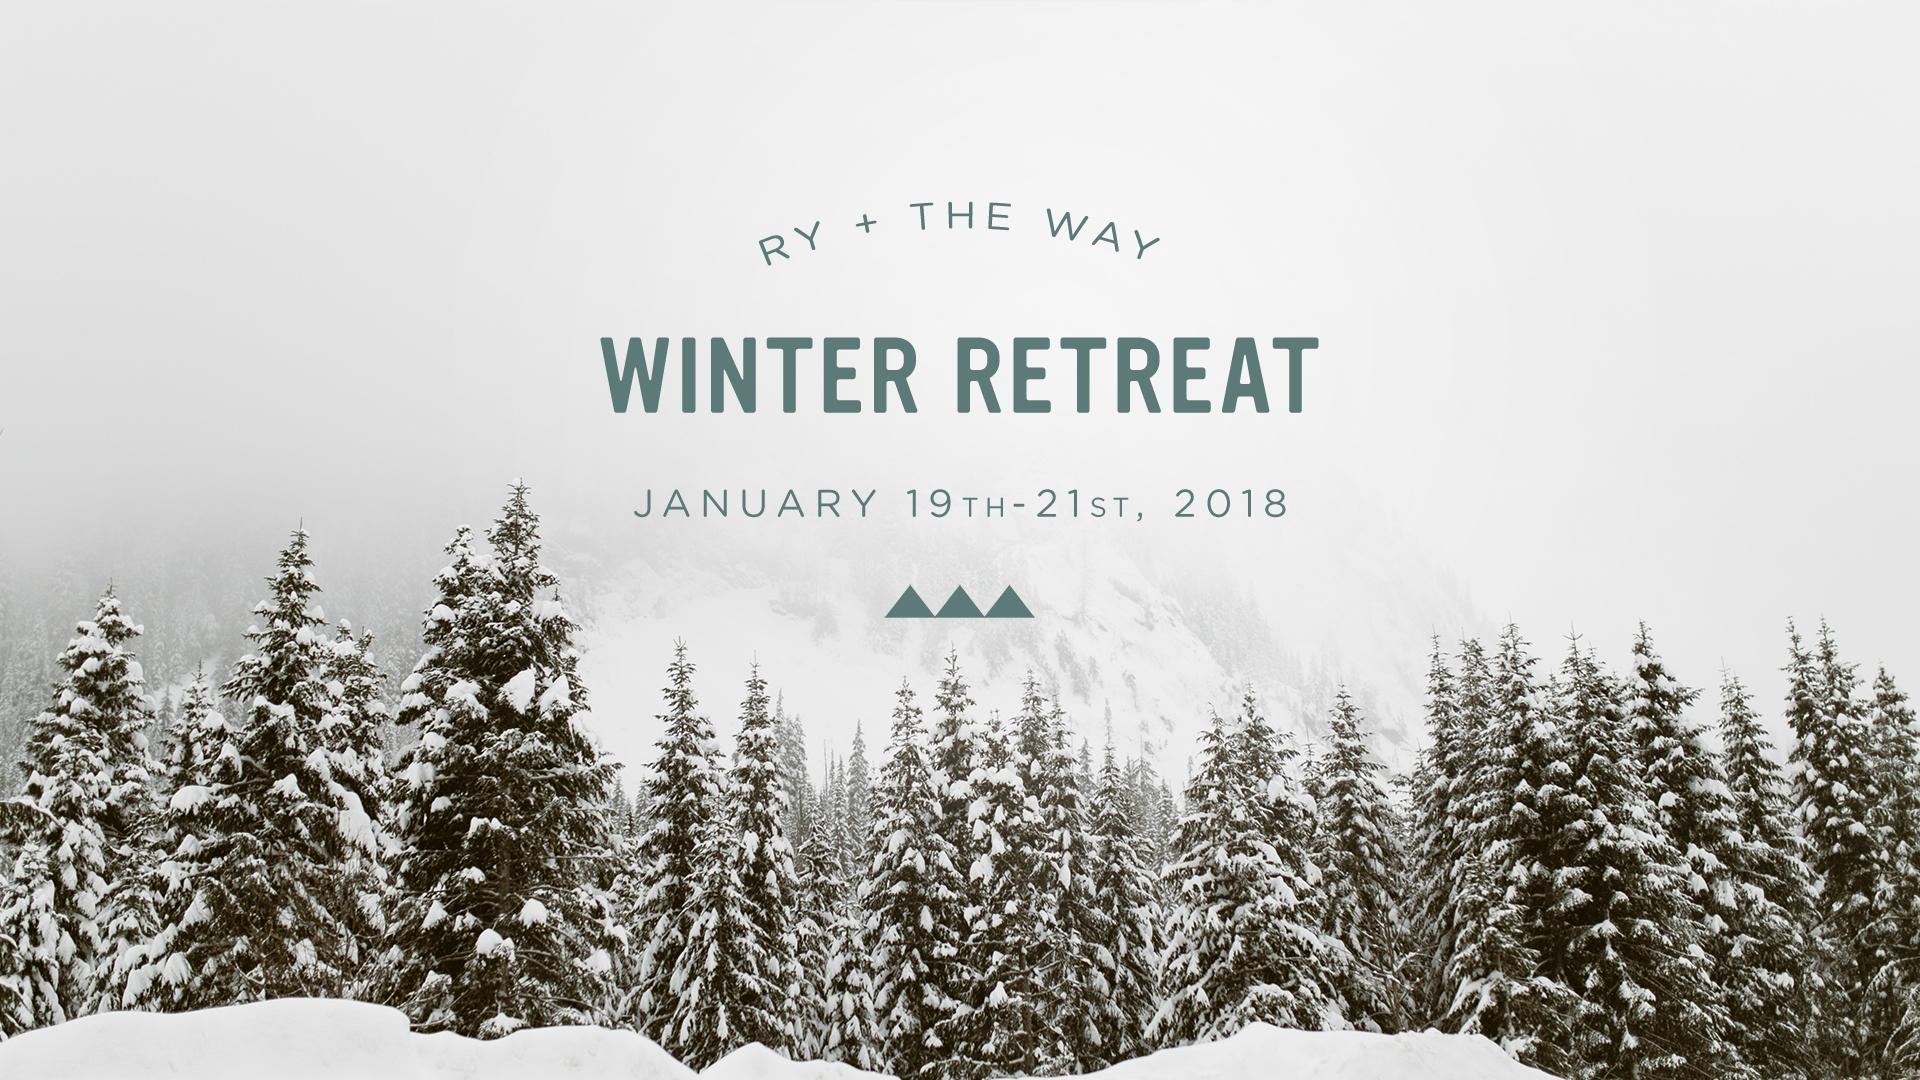 Ry winterretreat18